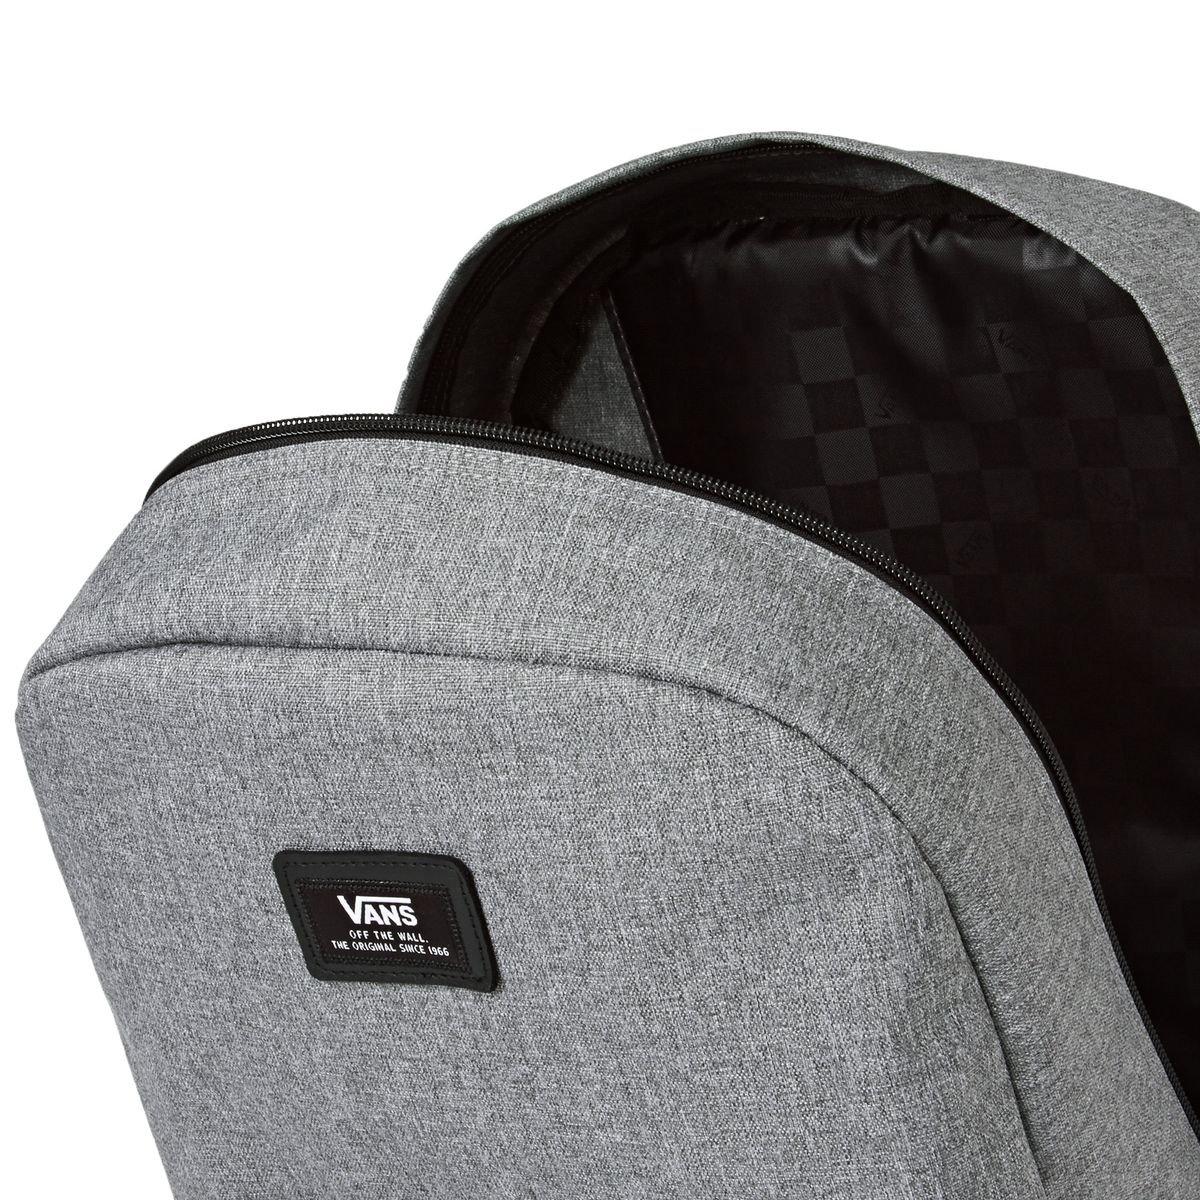 Amazon.com: Vans Old Skool II Logo Grey Backpack: VANS: Sports & Outdoors